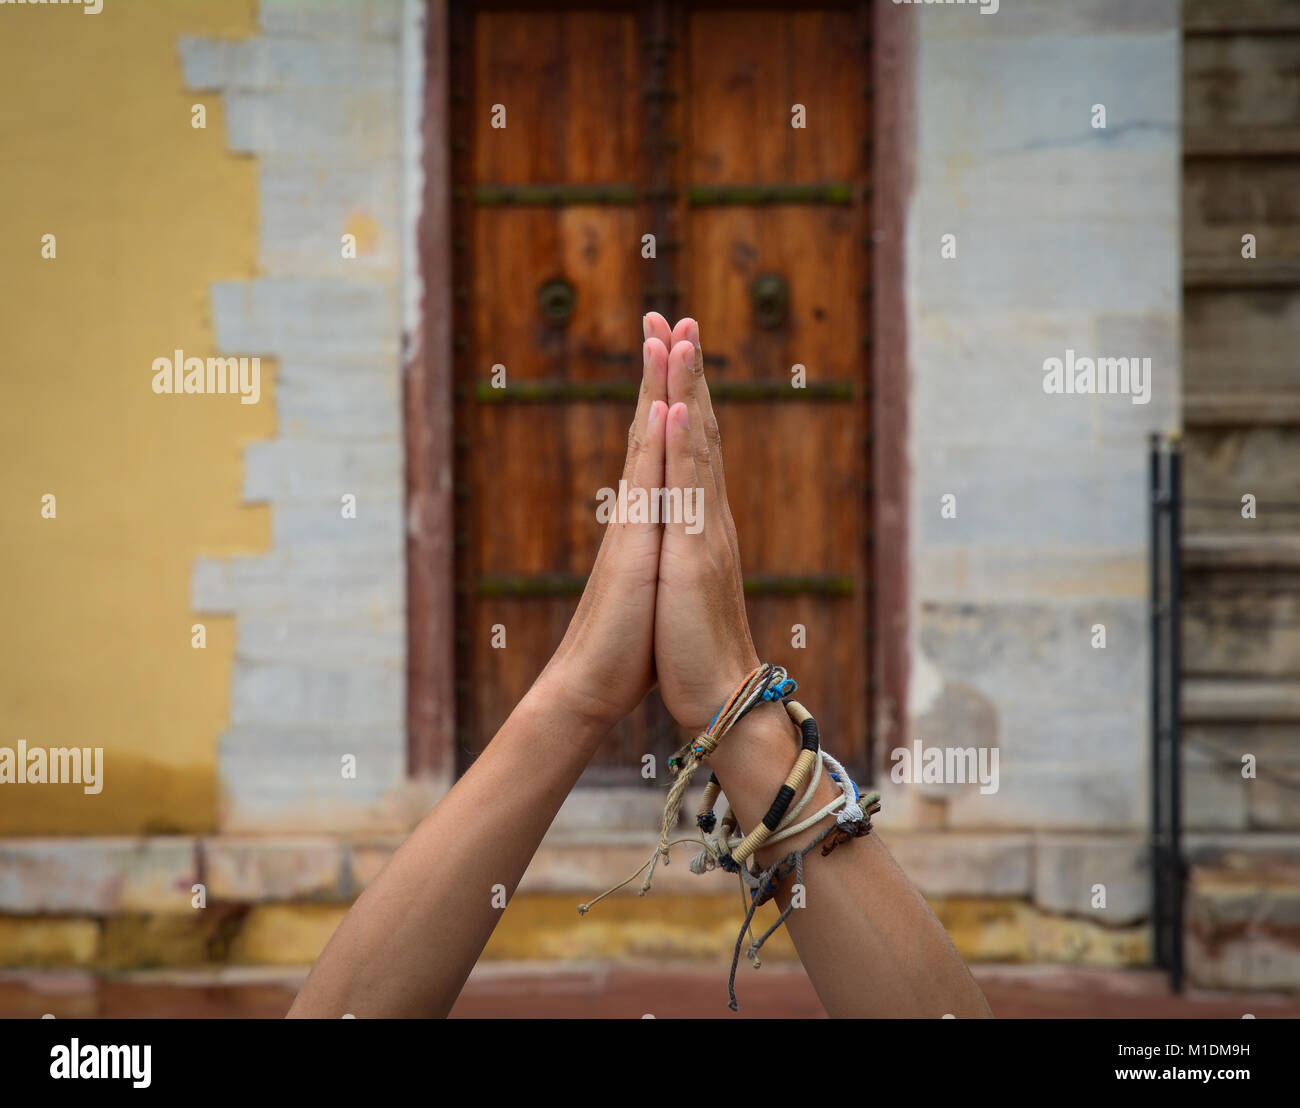 Hands In Namaste Prayer Mudra By Indian Man Practicing Yoga Stock